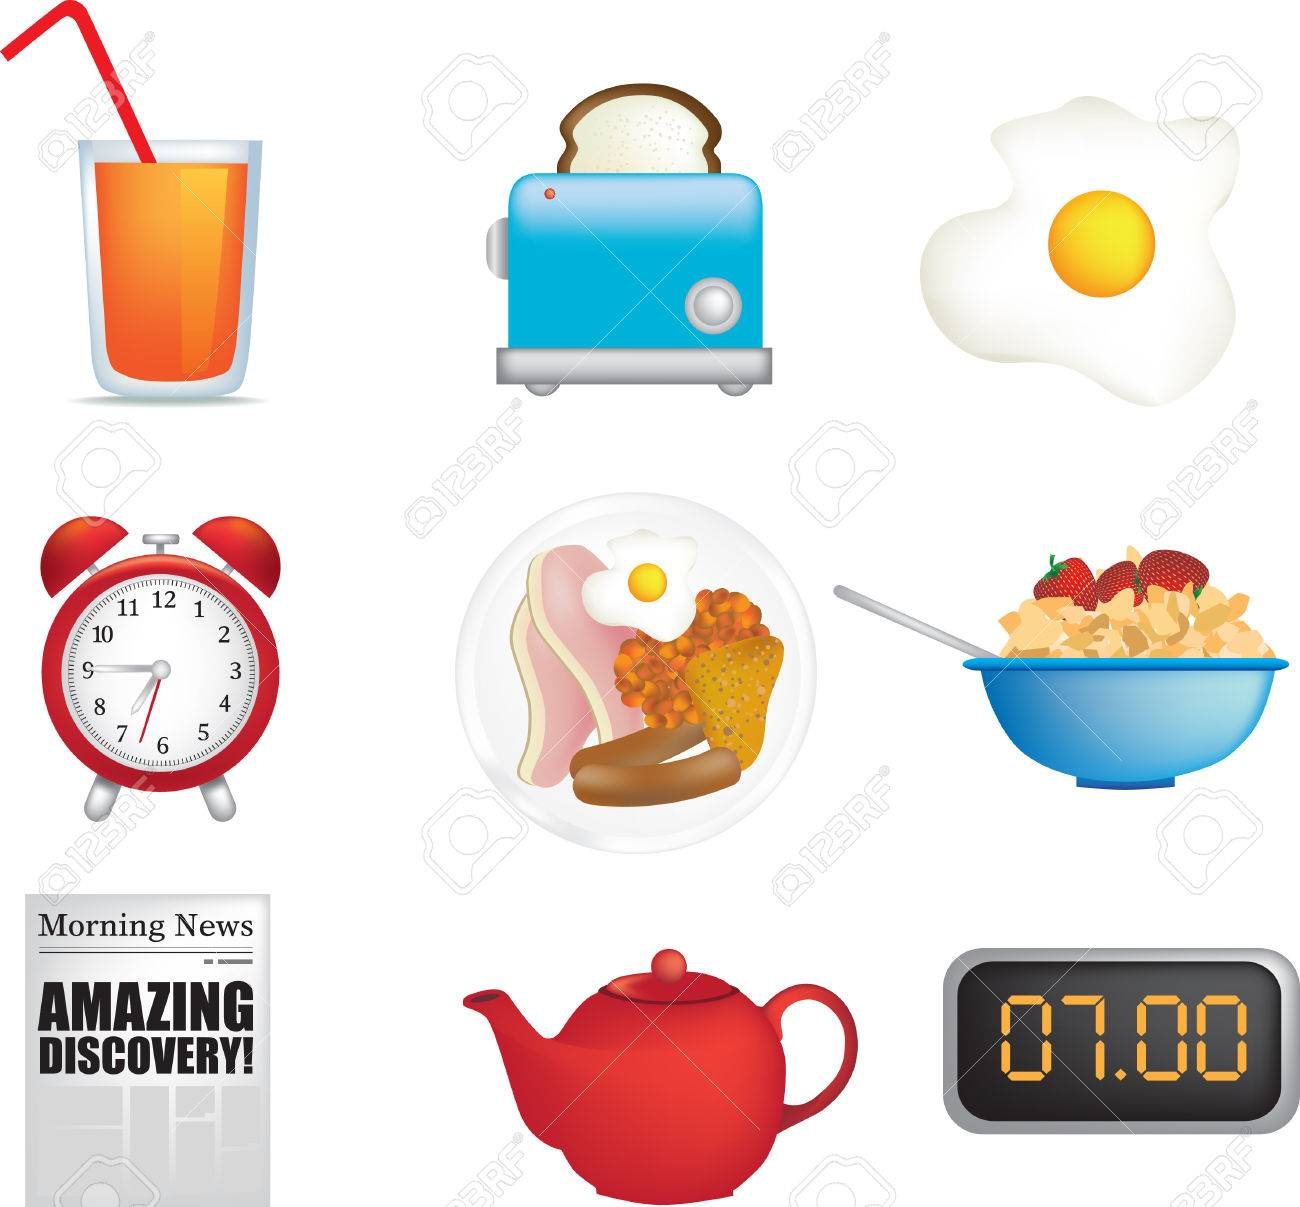 breakfast icon set illustrations set of 9 Stock Vector - 4974394